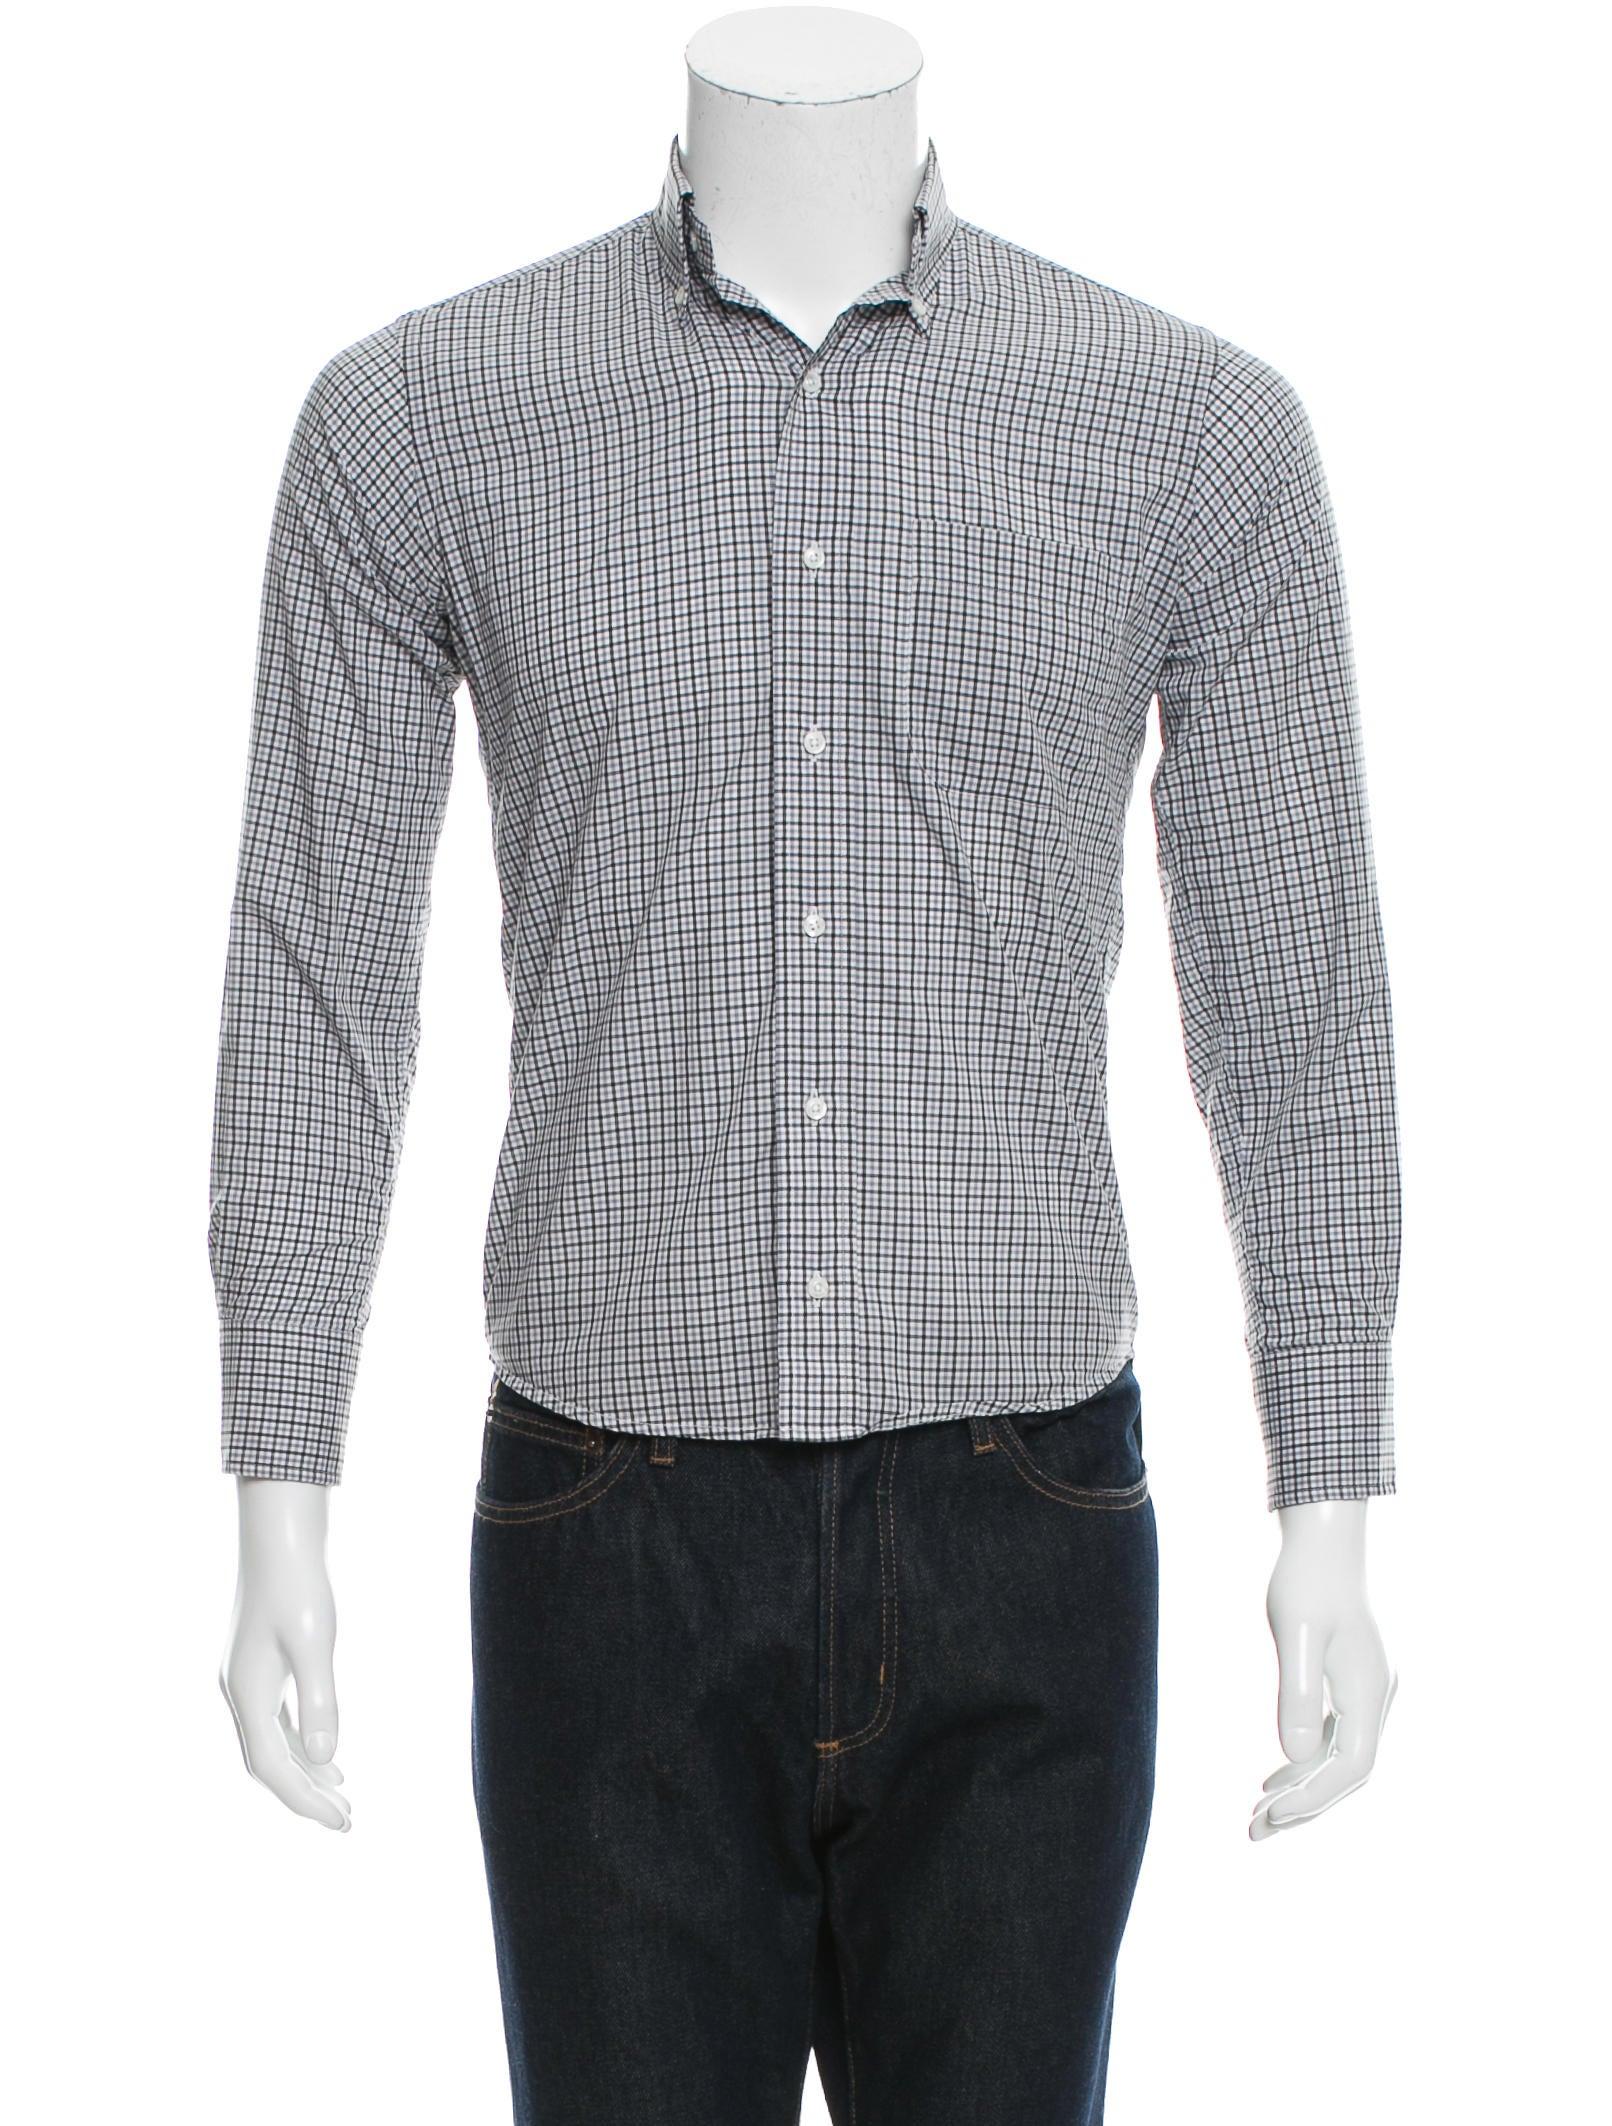 Thom browne plaid button up shirt clothing tho21861 for Thom browne shirt sale